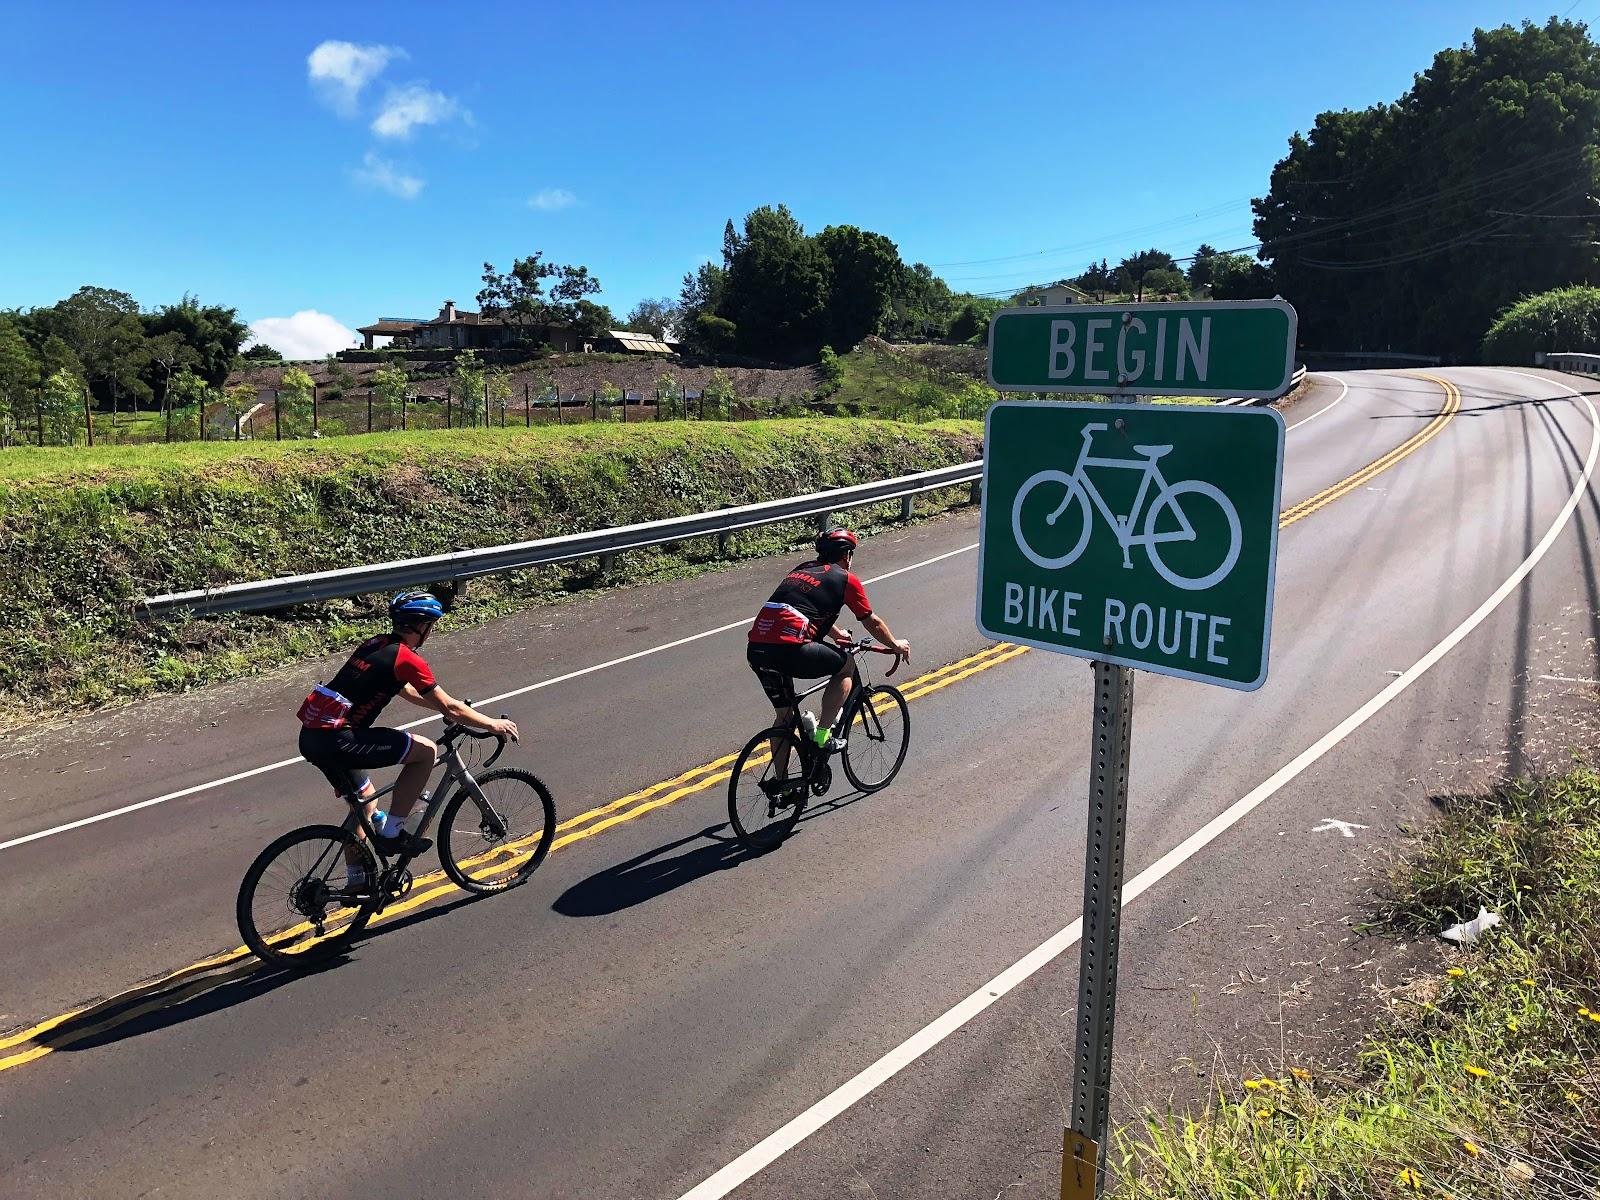 Bicycle climb of Waipoli Road - cyclist and bike sign at start of Waipoli Rd